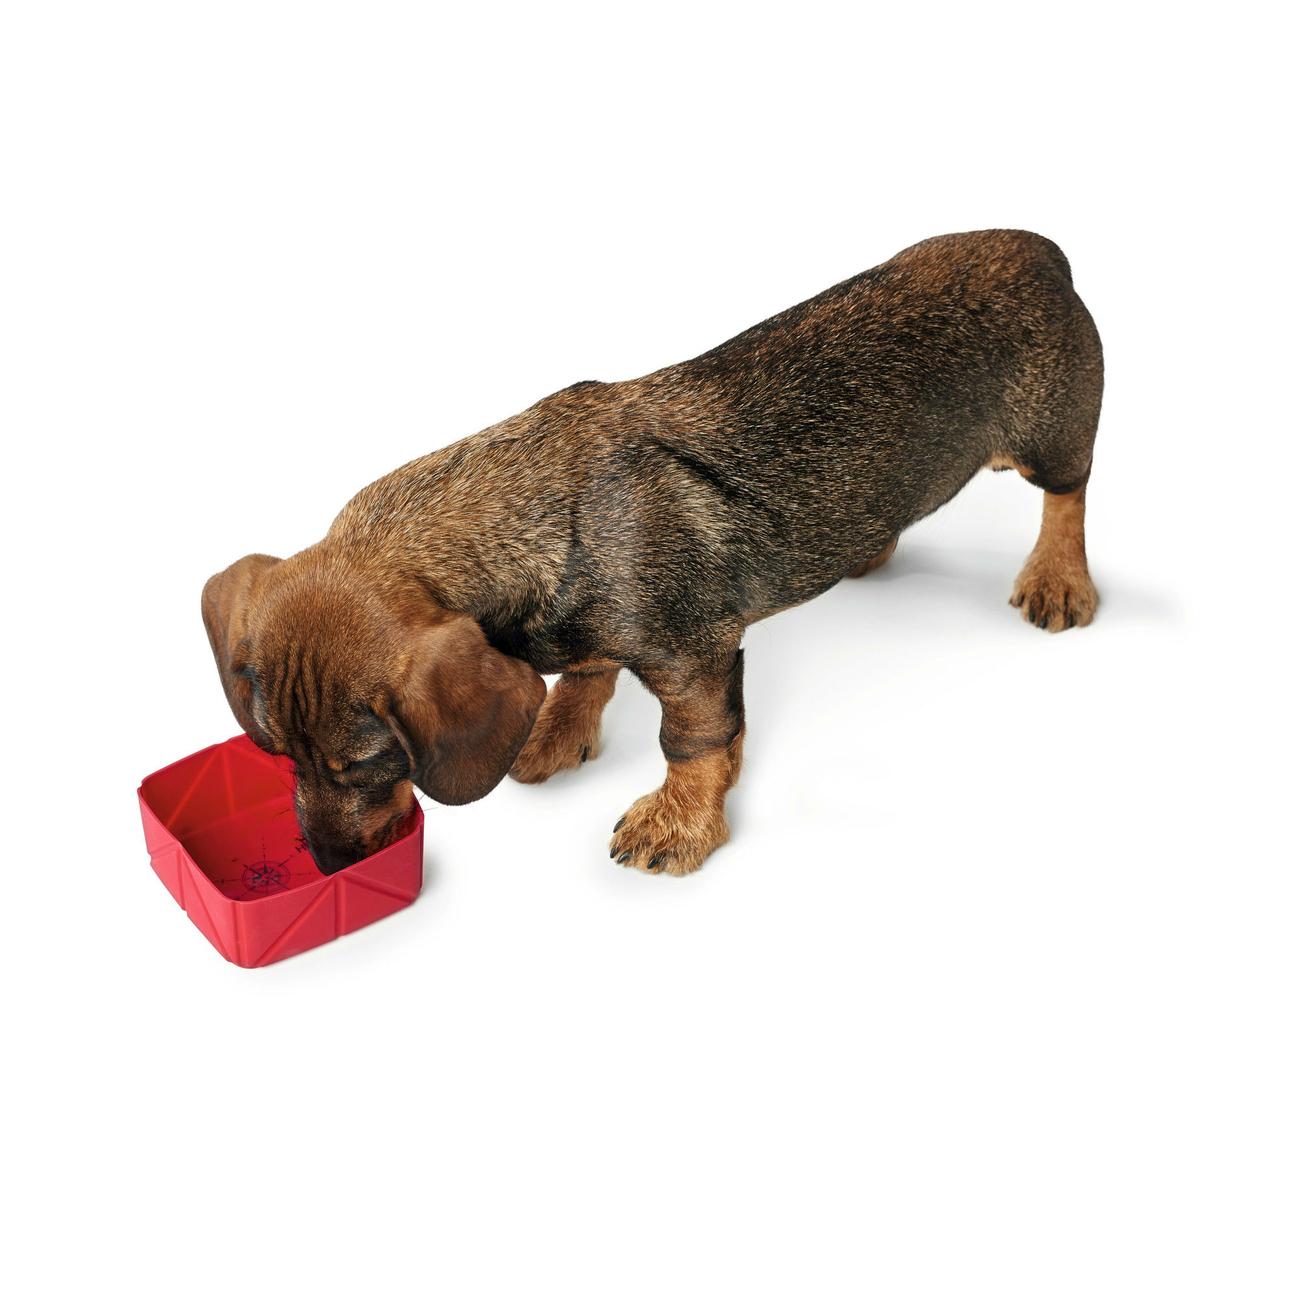 Hunter Silikon Falt-Reisenapf für Hunde List 65131, Bild 5